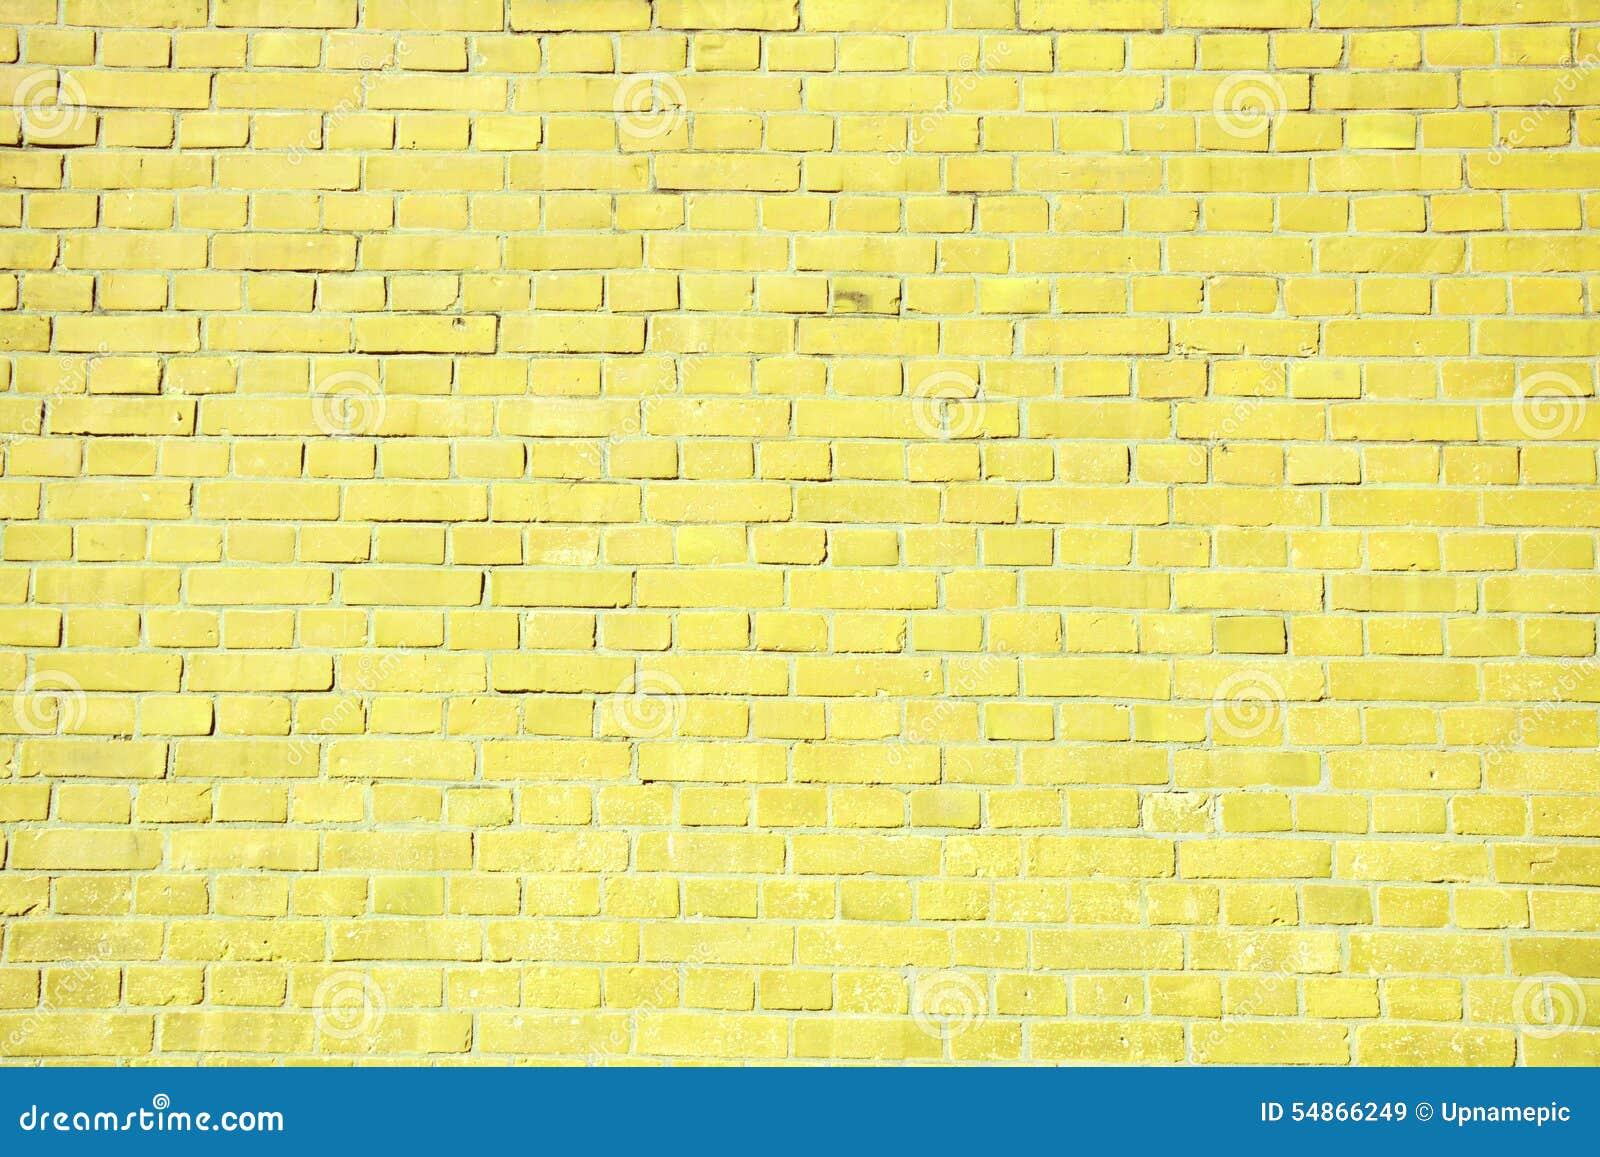 Amazing Clip Art Brick Wall Vignette - The Wall Art Decorations ...